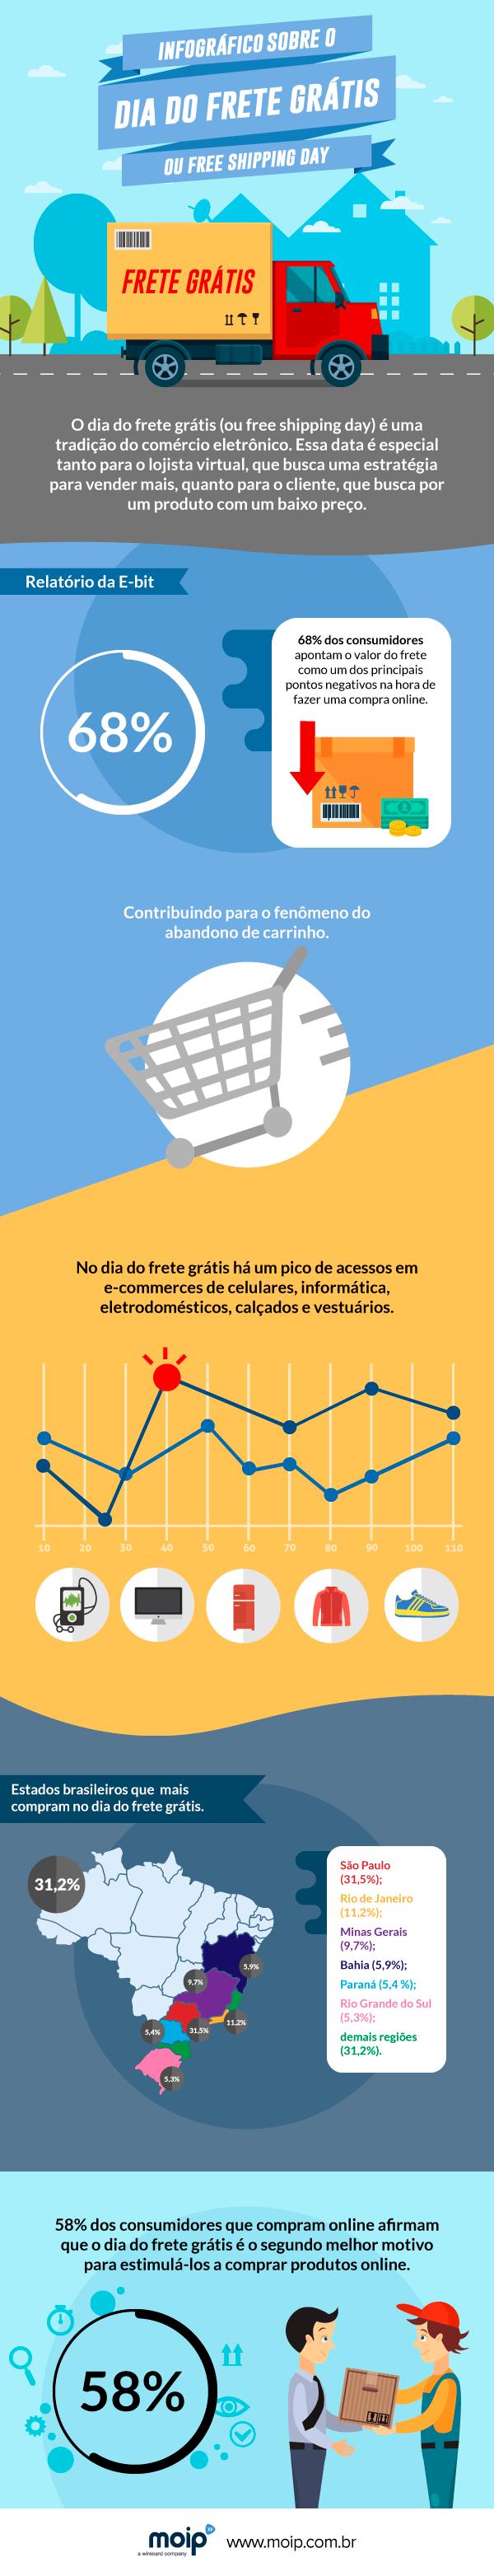 infografico dia do frete gratis